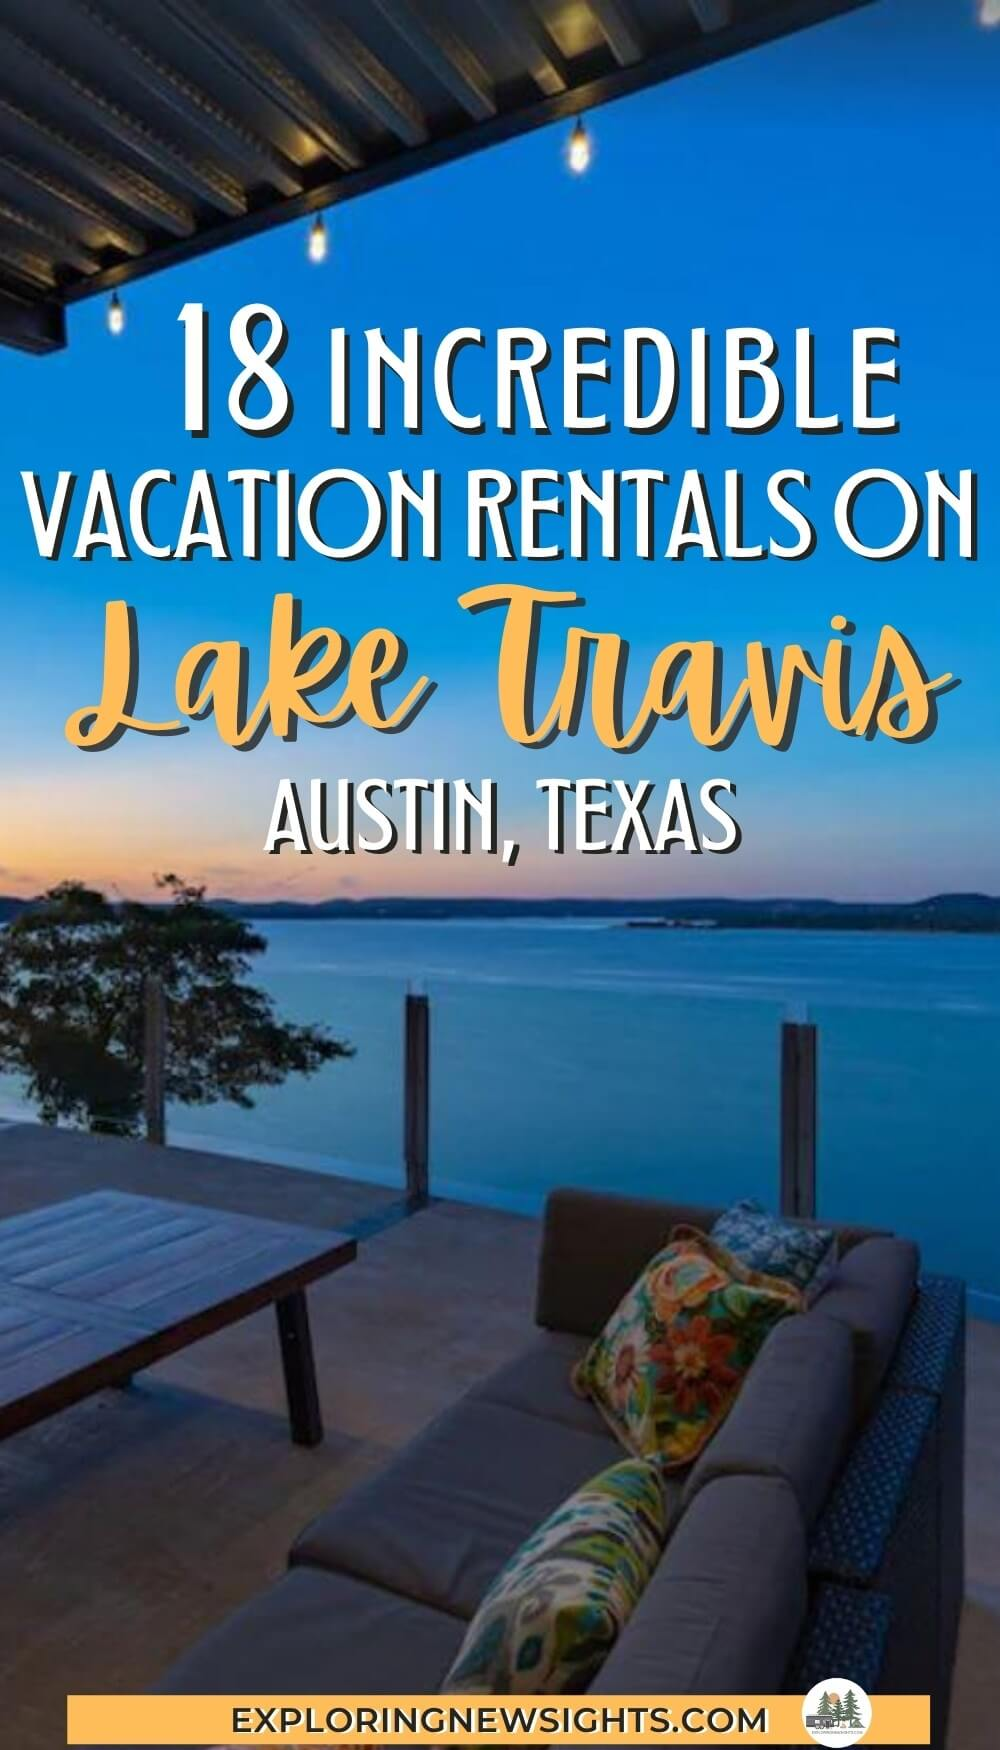 Vacation Rentals on Lake Travis (1)